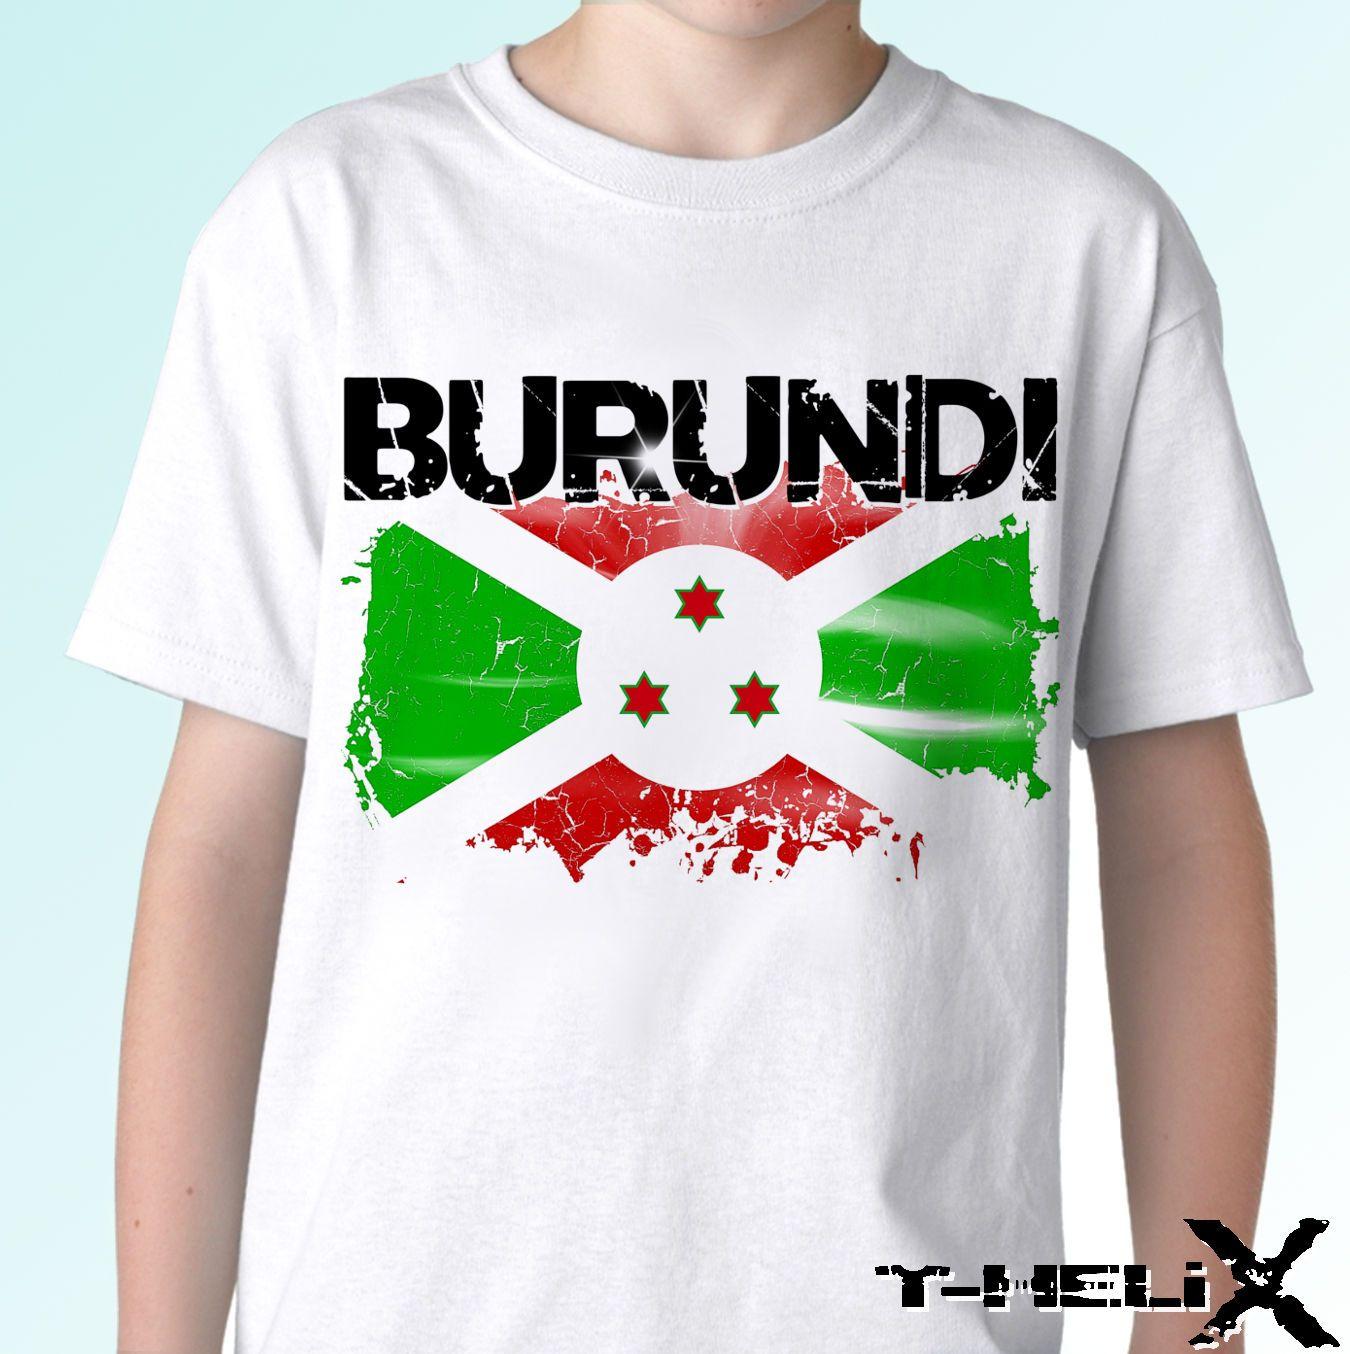 fc185b453 Burundi Flag - White T Shirt Top Africa Design - Mens Womens Cool ...